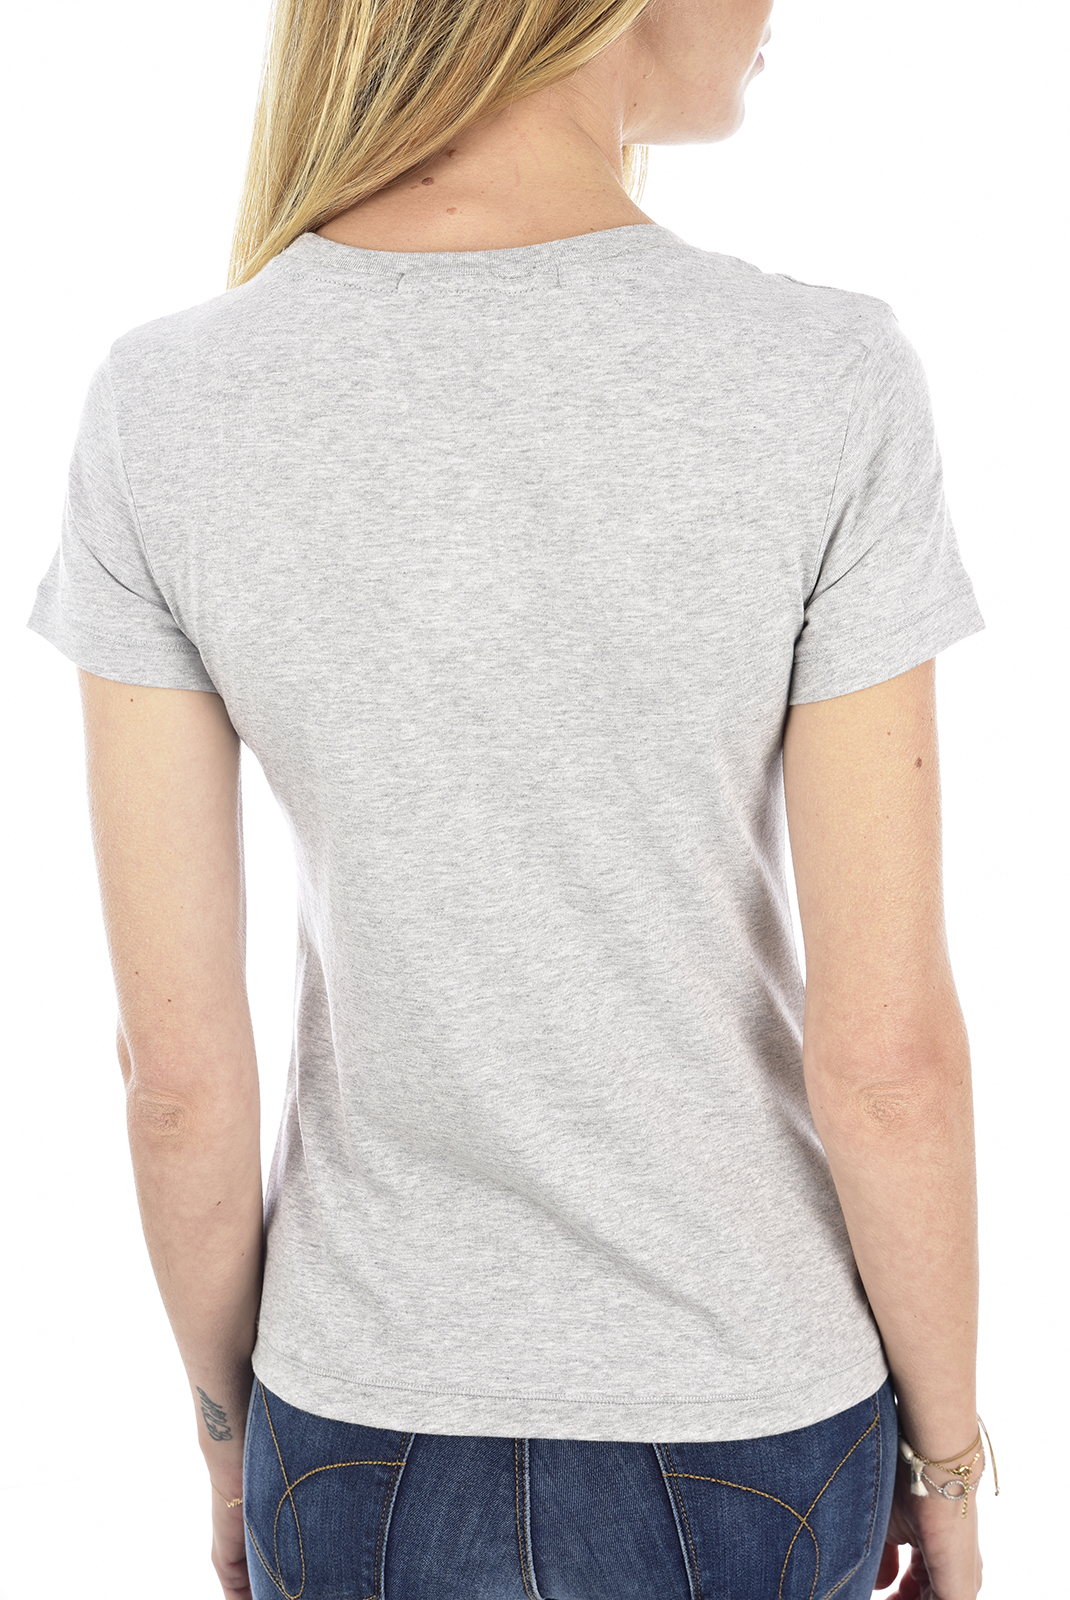 Tee shirt  Calvin klein J20J212883 EMBROIDERY P01 LIGHT GREY